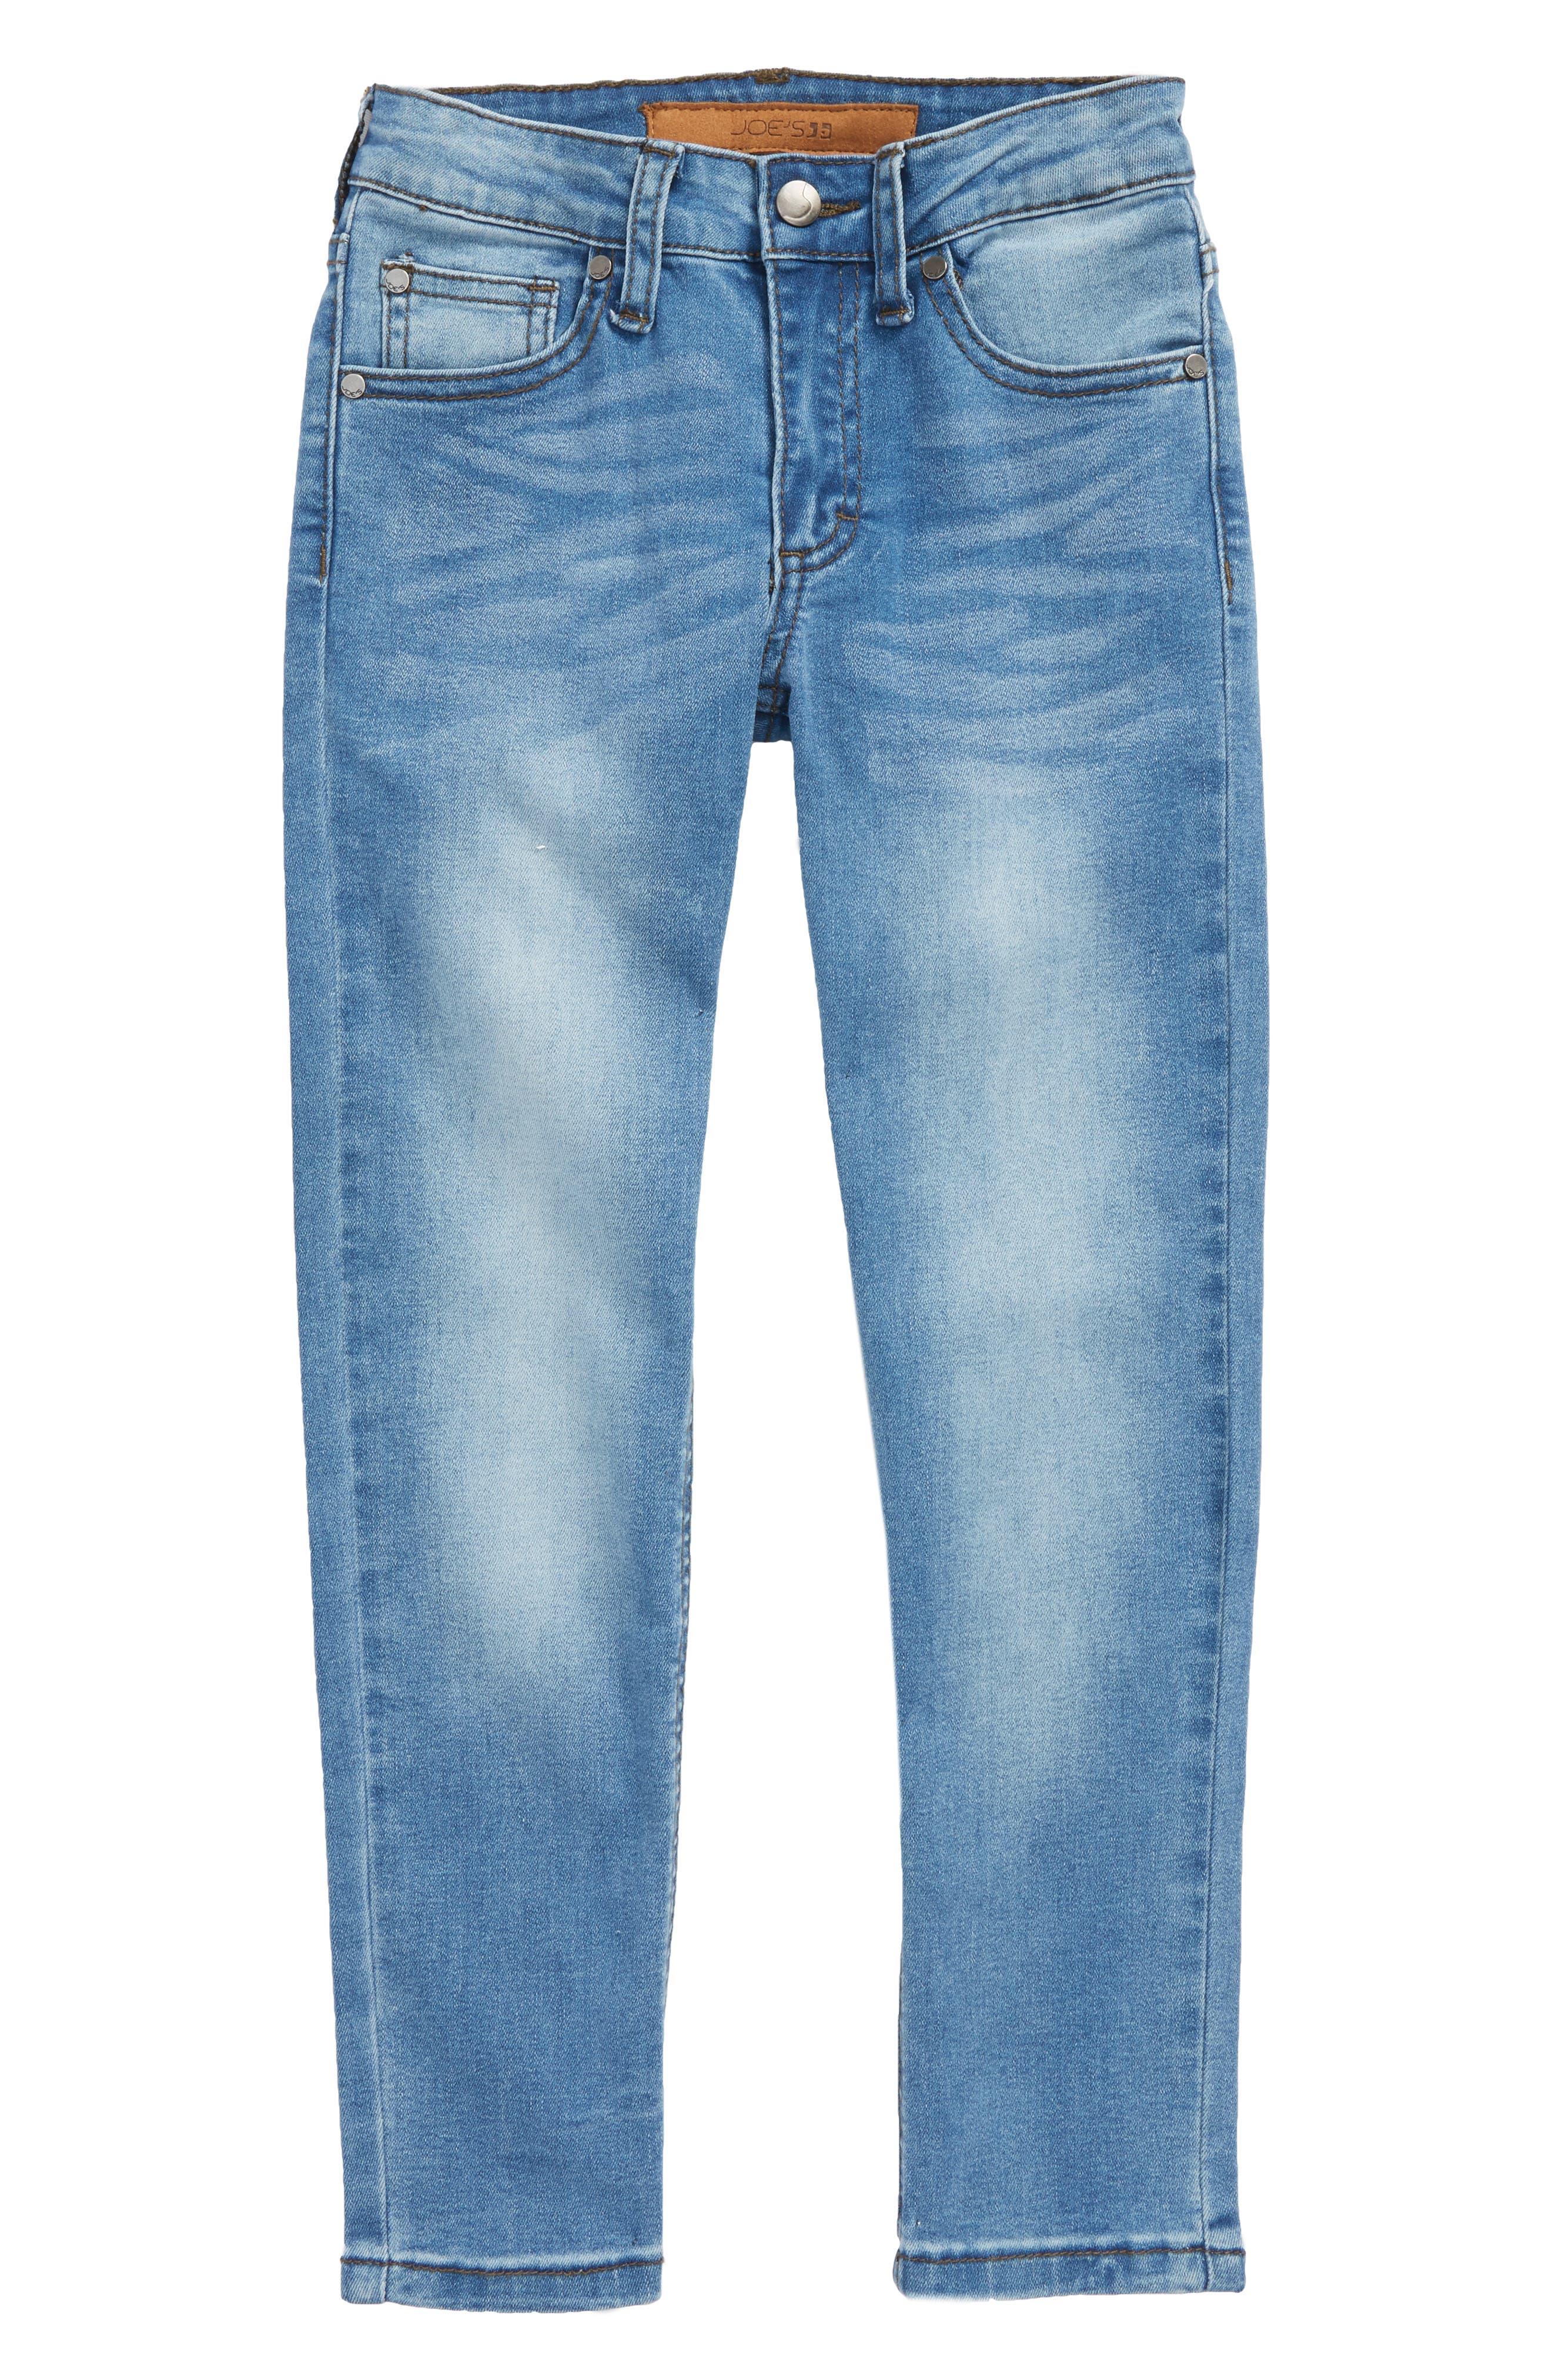 Joe's Rad Slim Fit Stretch Jeans (Toddler Boys & Little Boys)